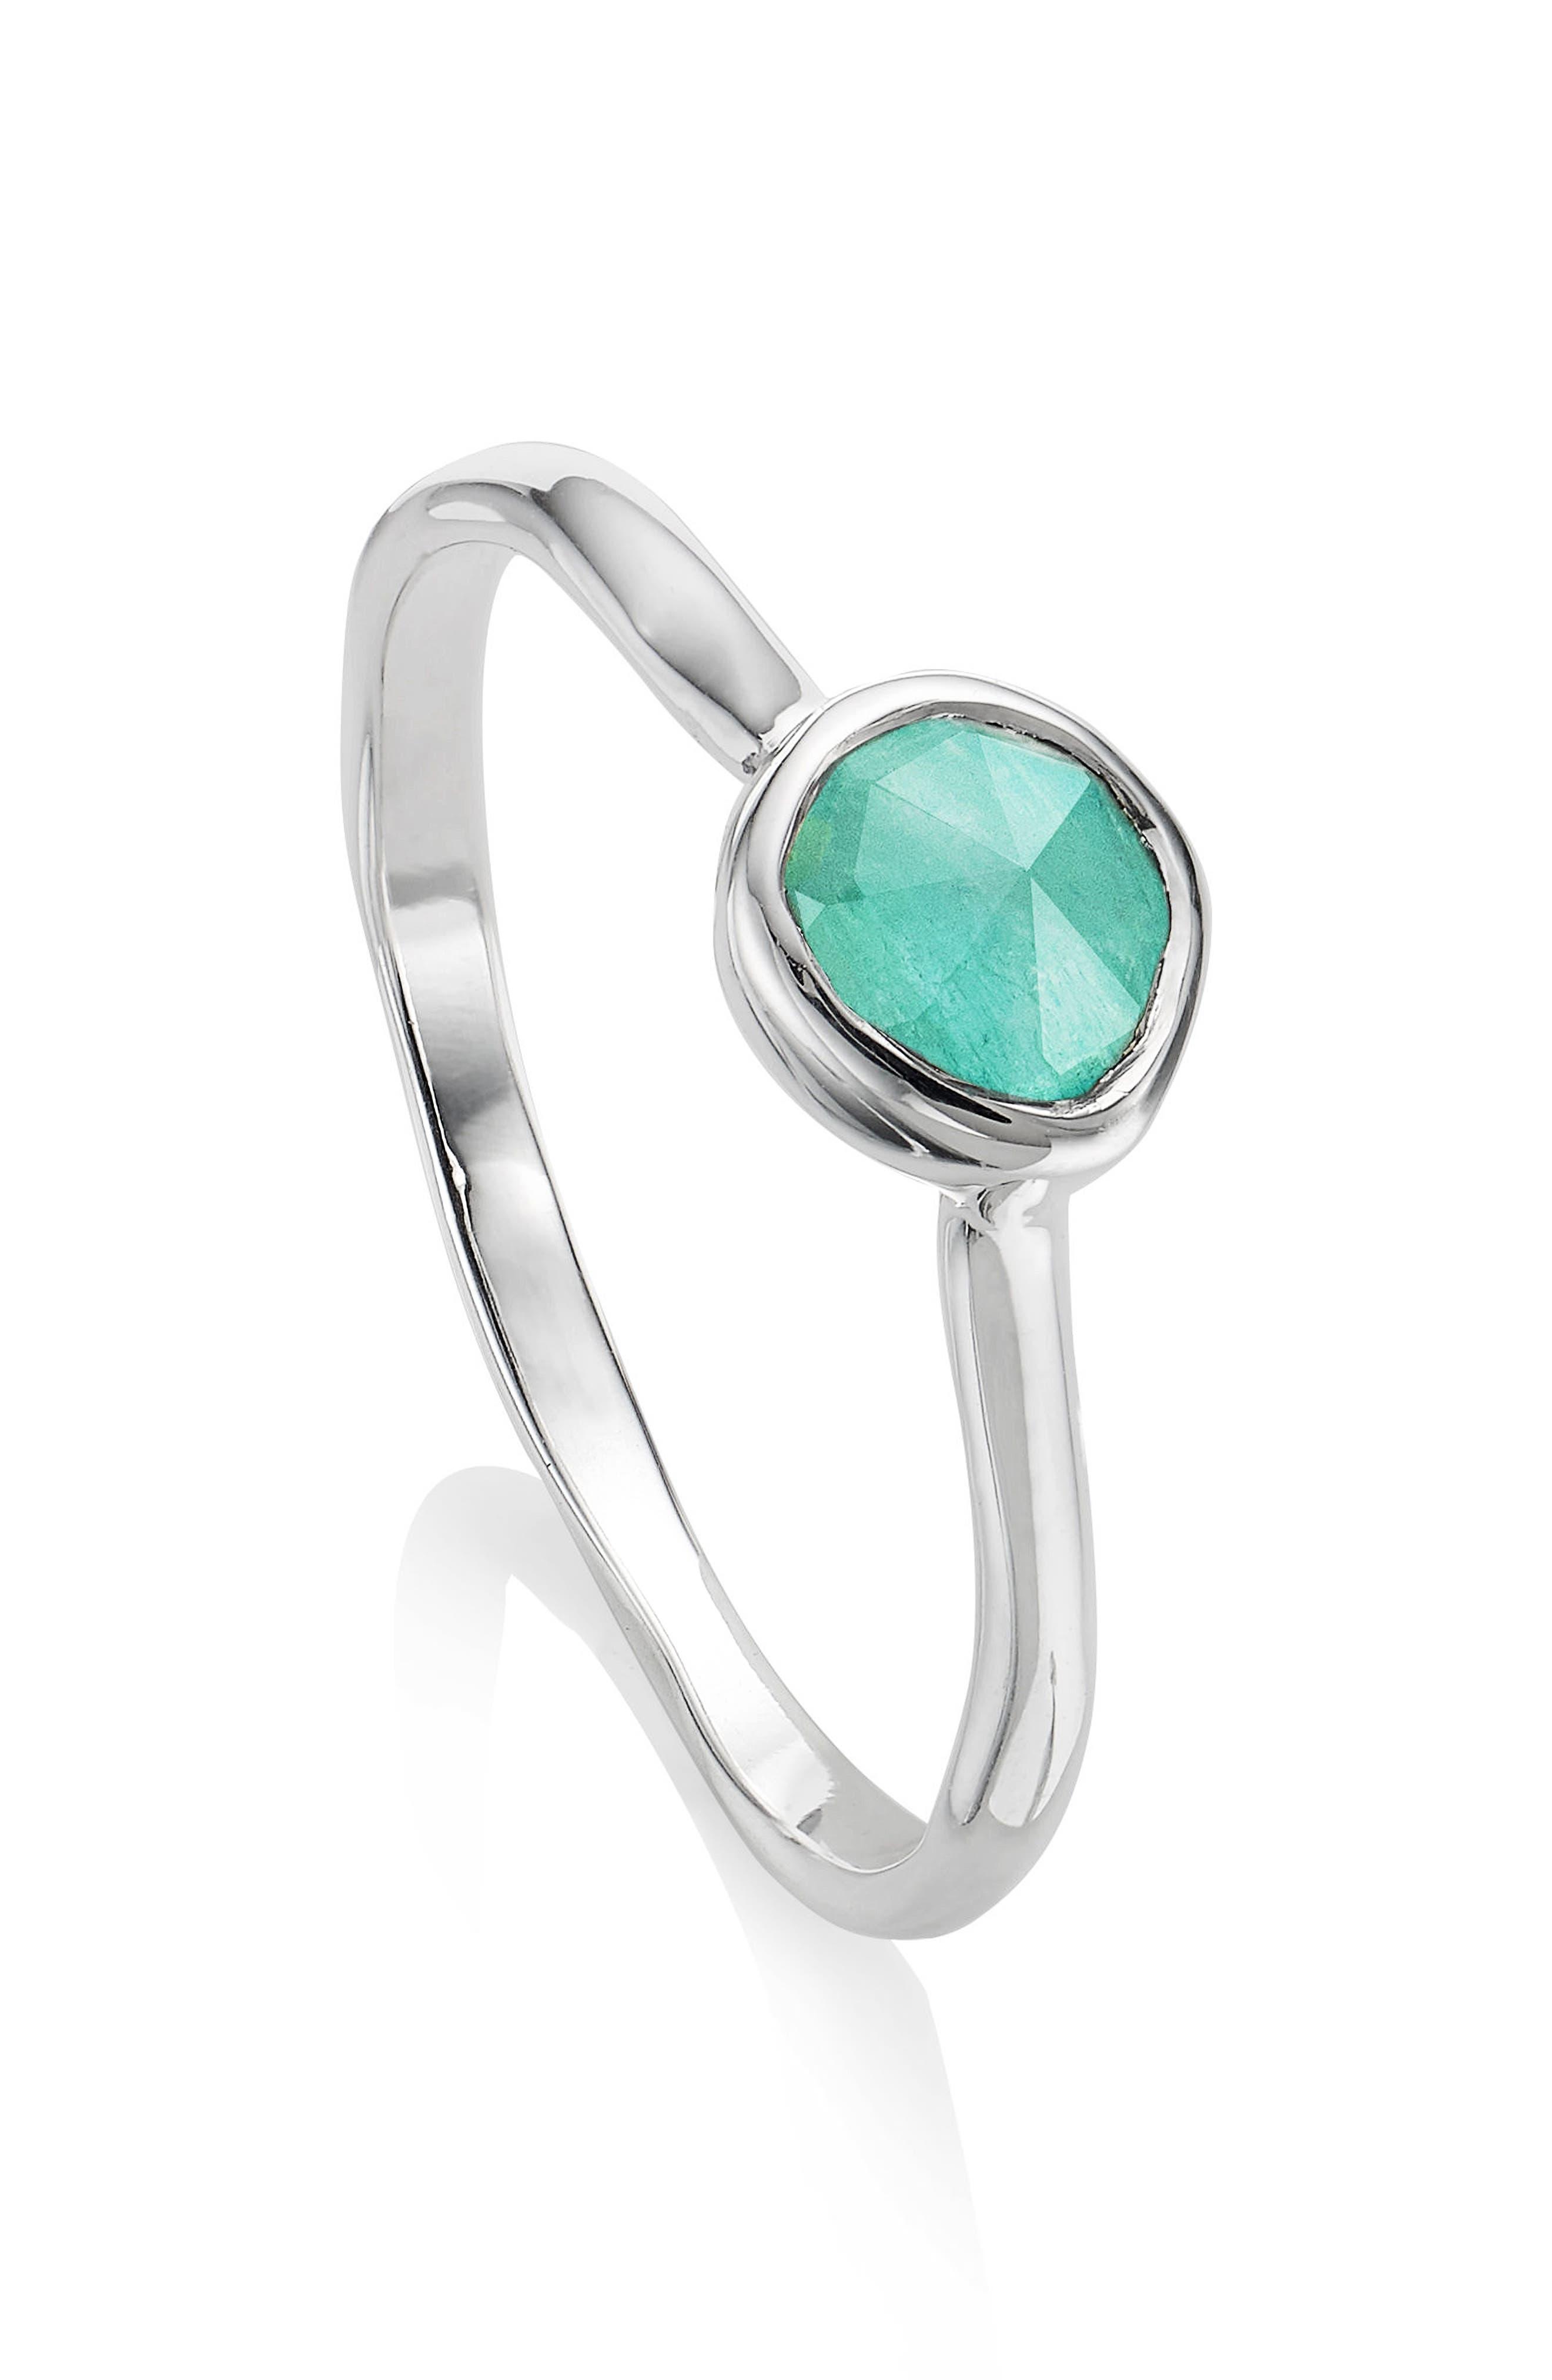 Siren Small Stacking Ring,                             Main thumbnail 1, color,                             SILVER/ AMAZONITE